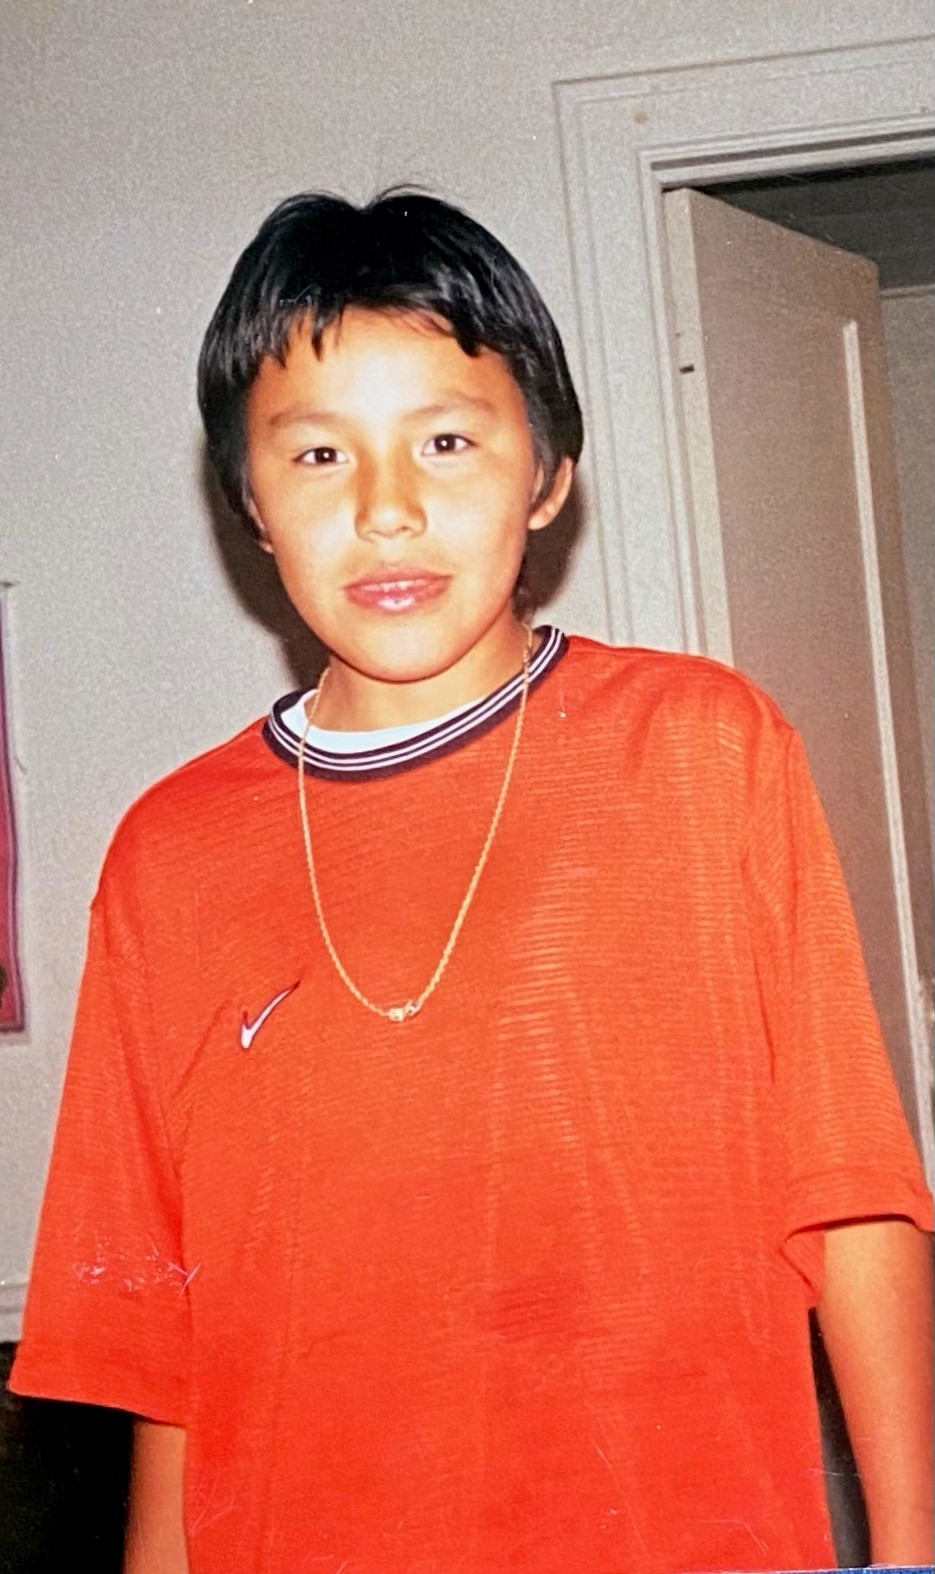 Nike orange shirt